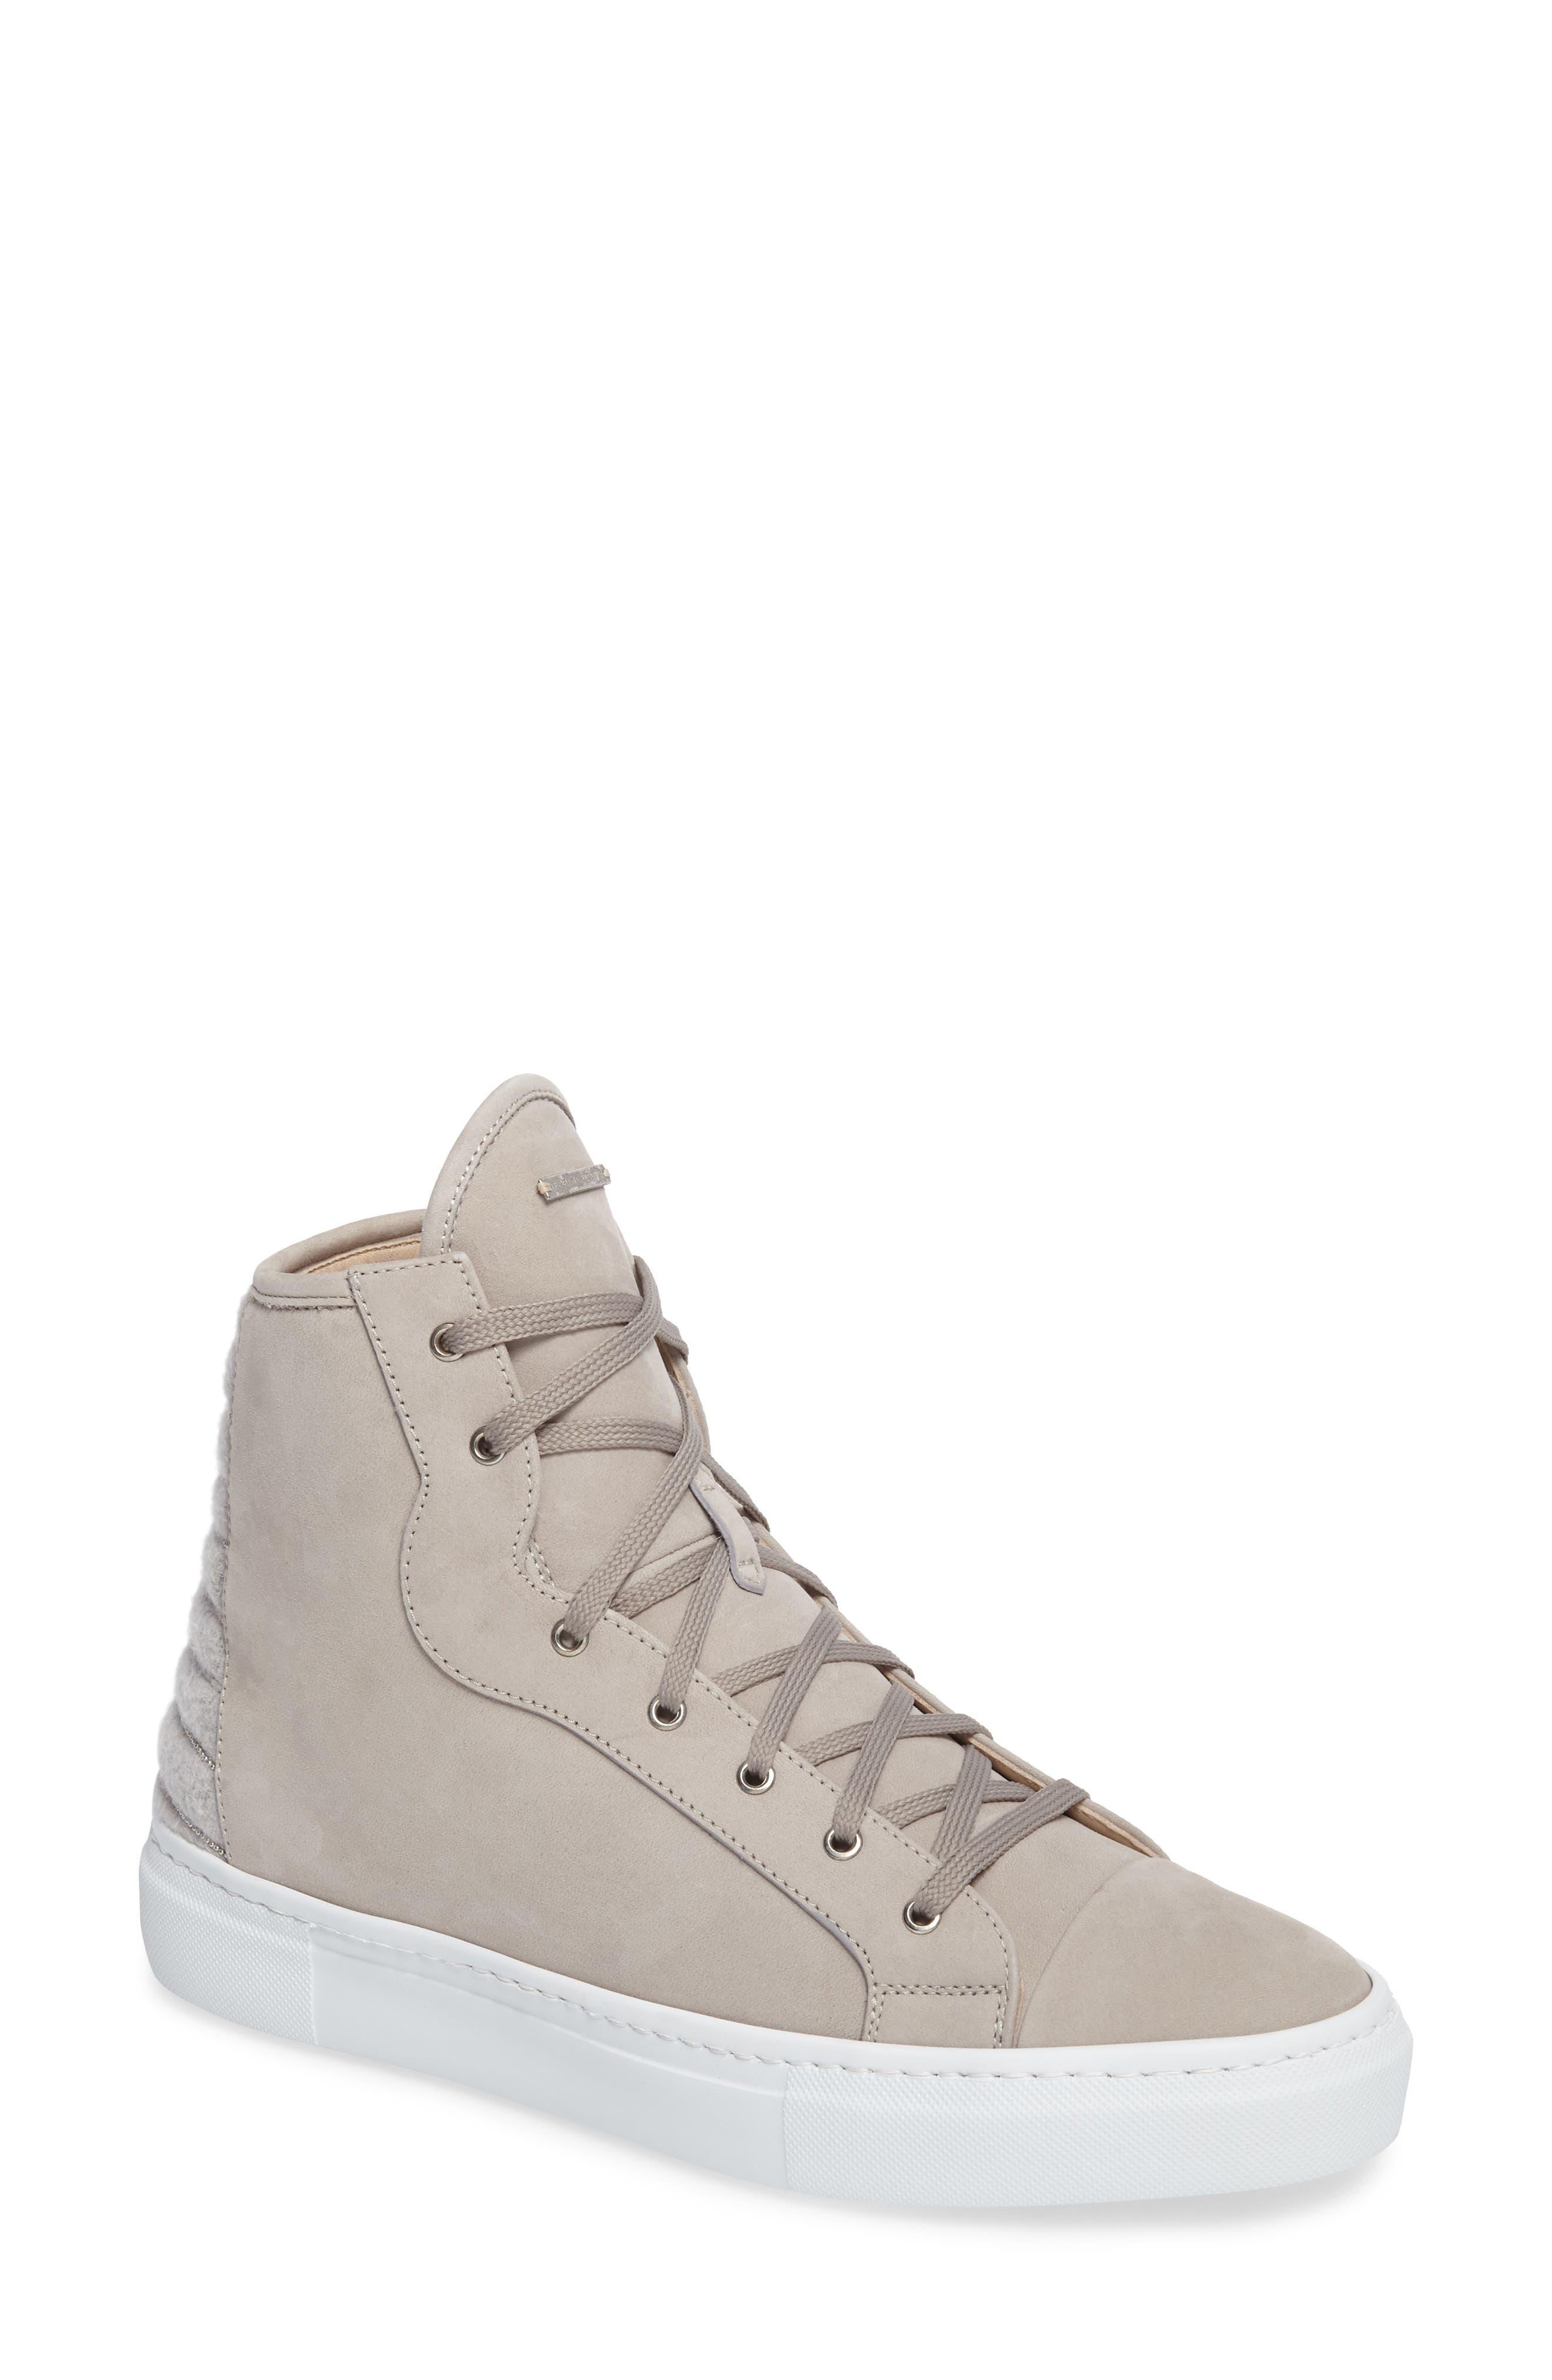 Eva High Top Sneaker,                         Main,                         color, 250